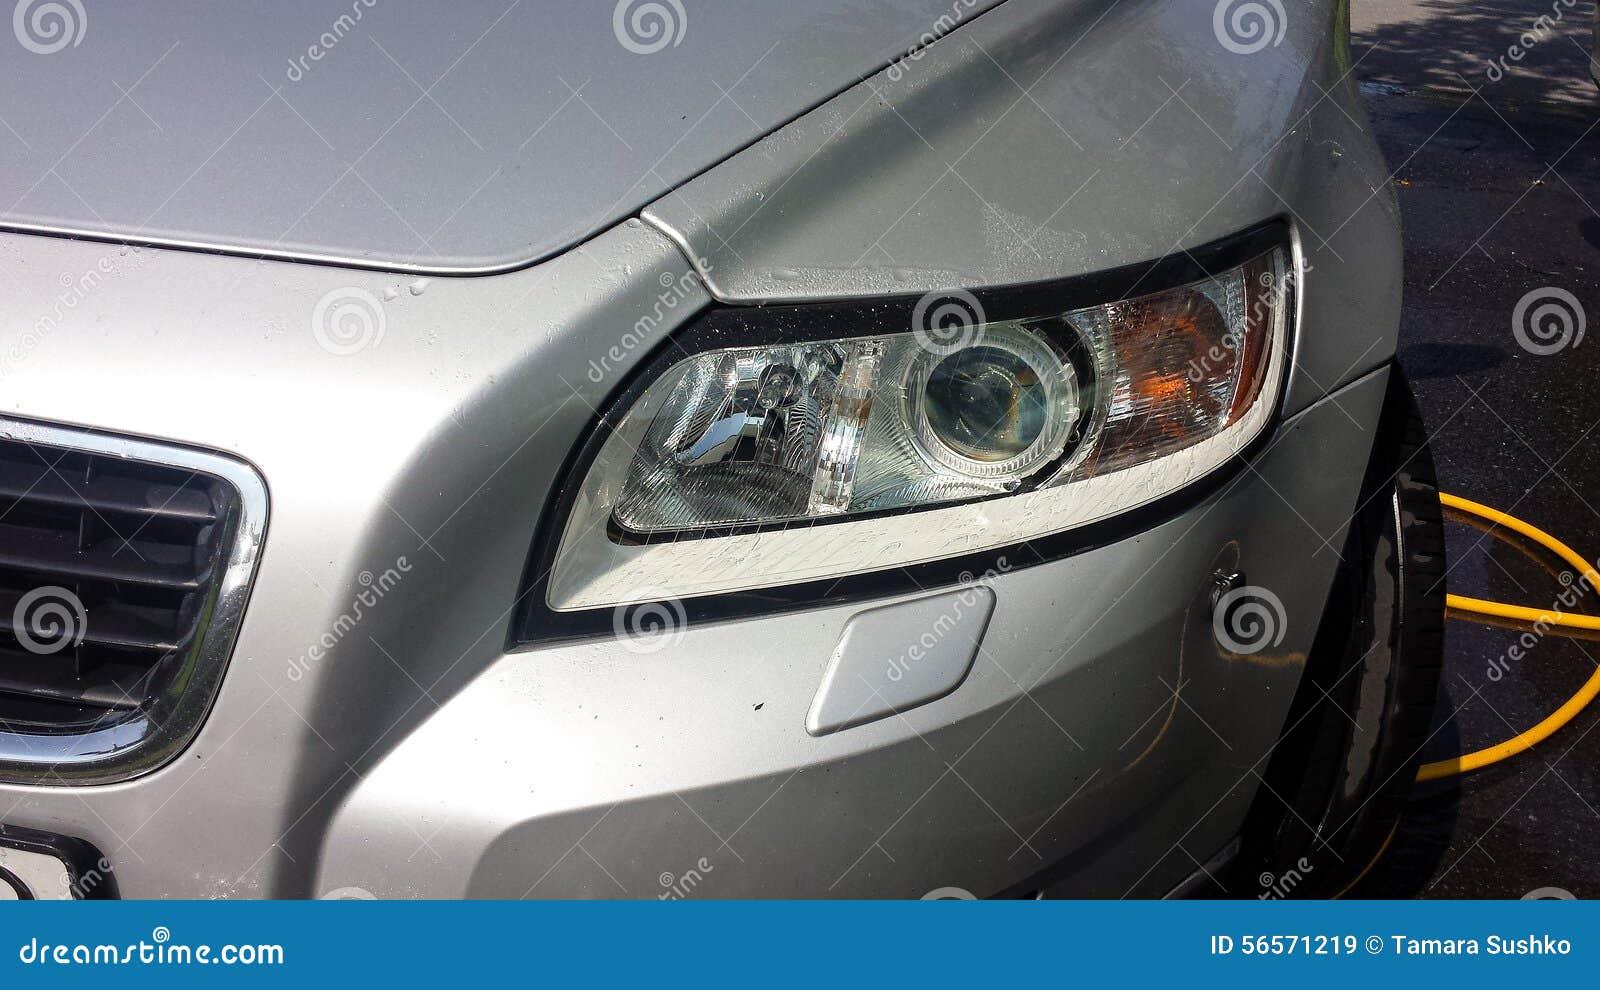 Download Βάψιμο παραθύρων αυτοκινήτων Στοκ Εικόνα - εικόνα από αφρός, υπηρεσία: 56571219